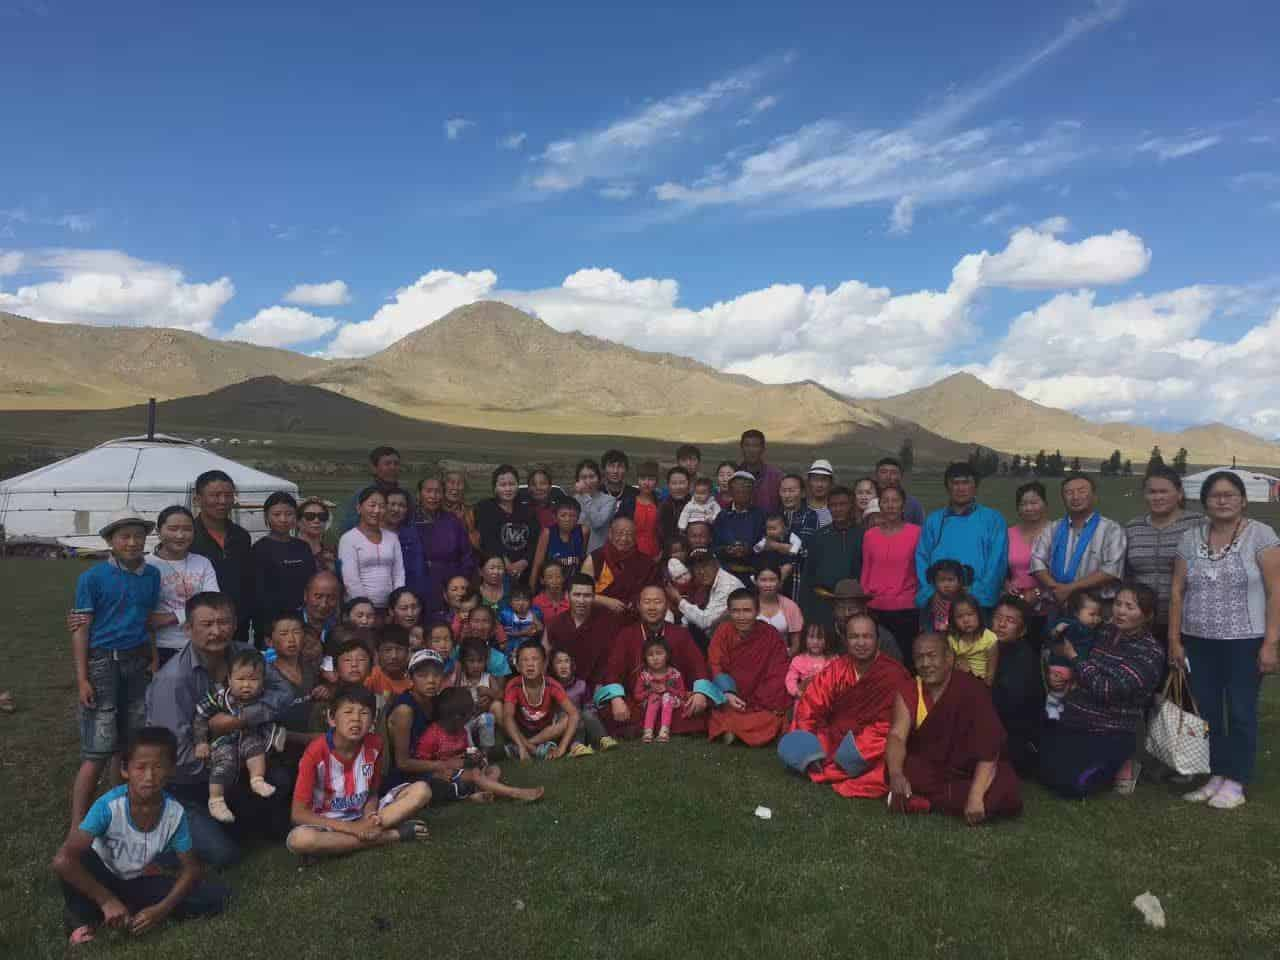 gosok-rinpoche-mongolia-2016-3bd1e3faeec352cbda19b2fb385547b